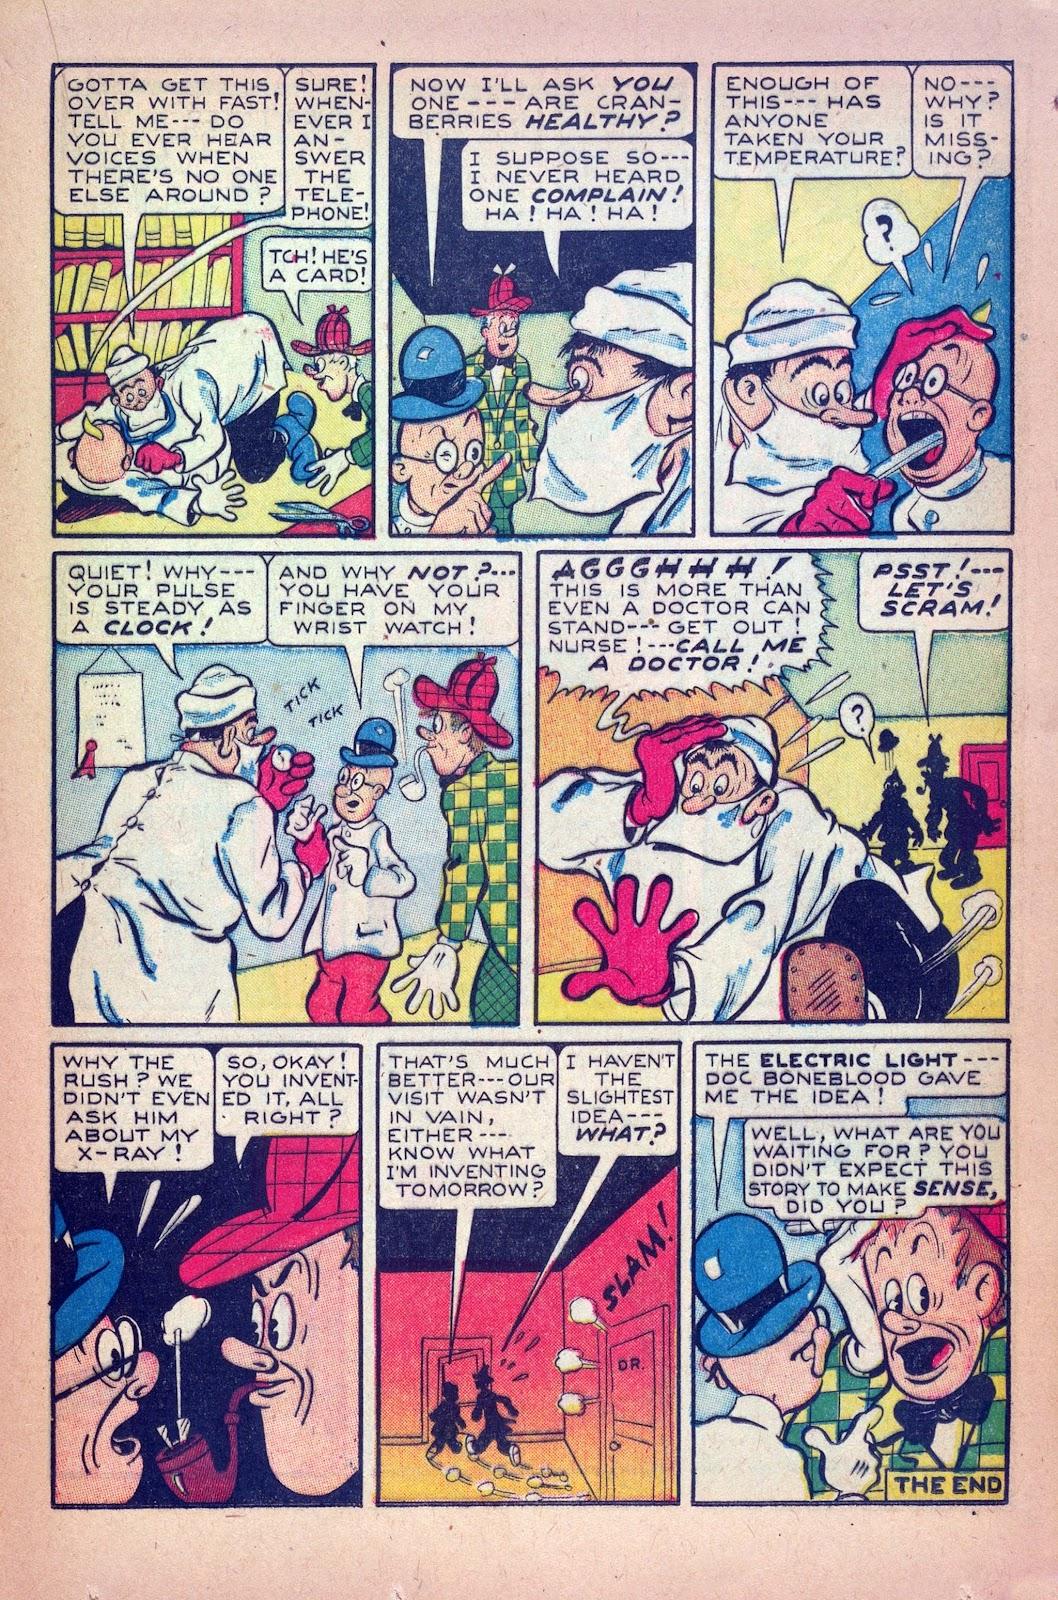 Read online Joker Comics comic -  Issue #18 - 21